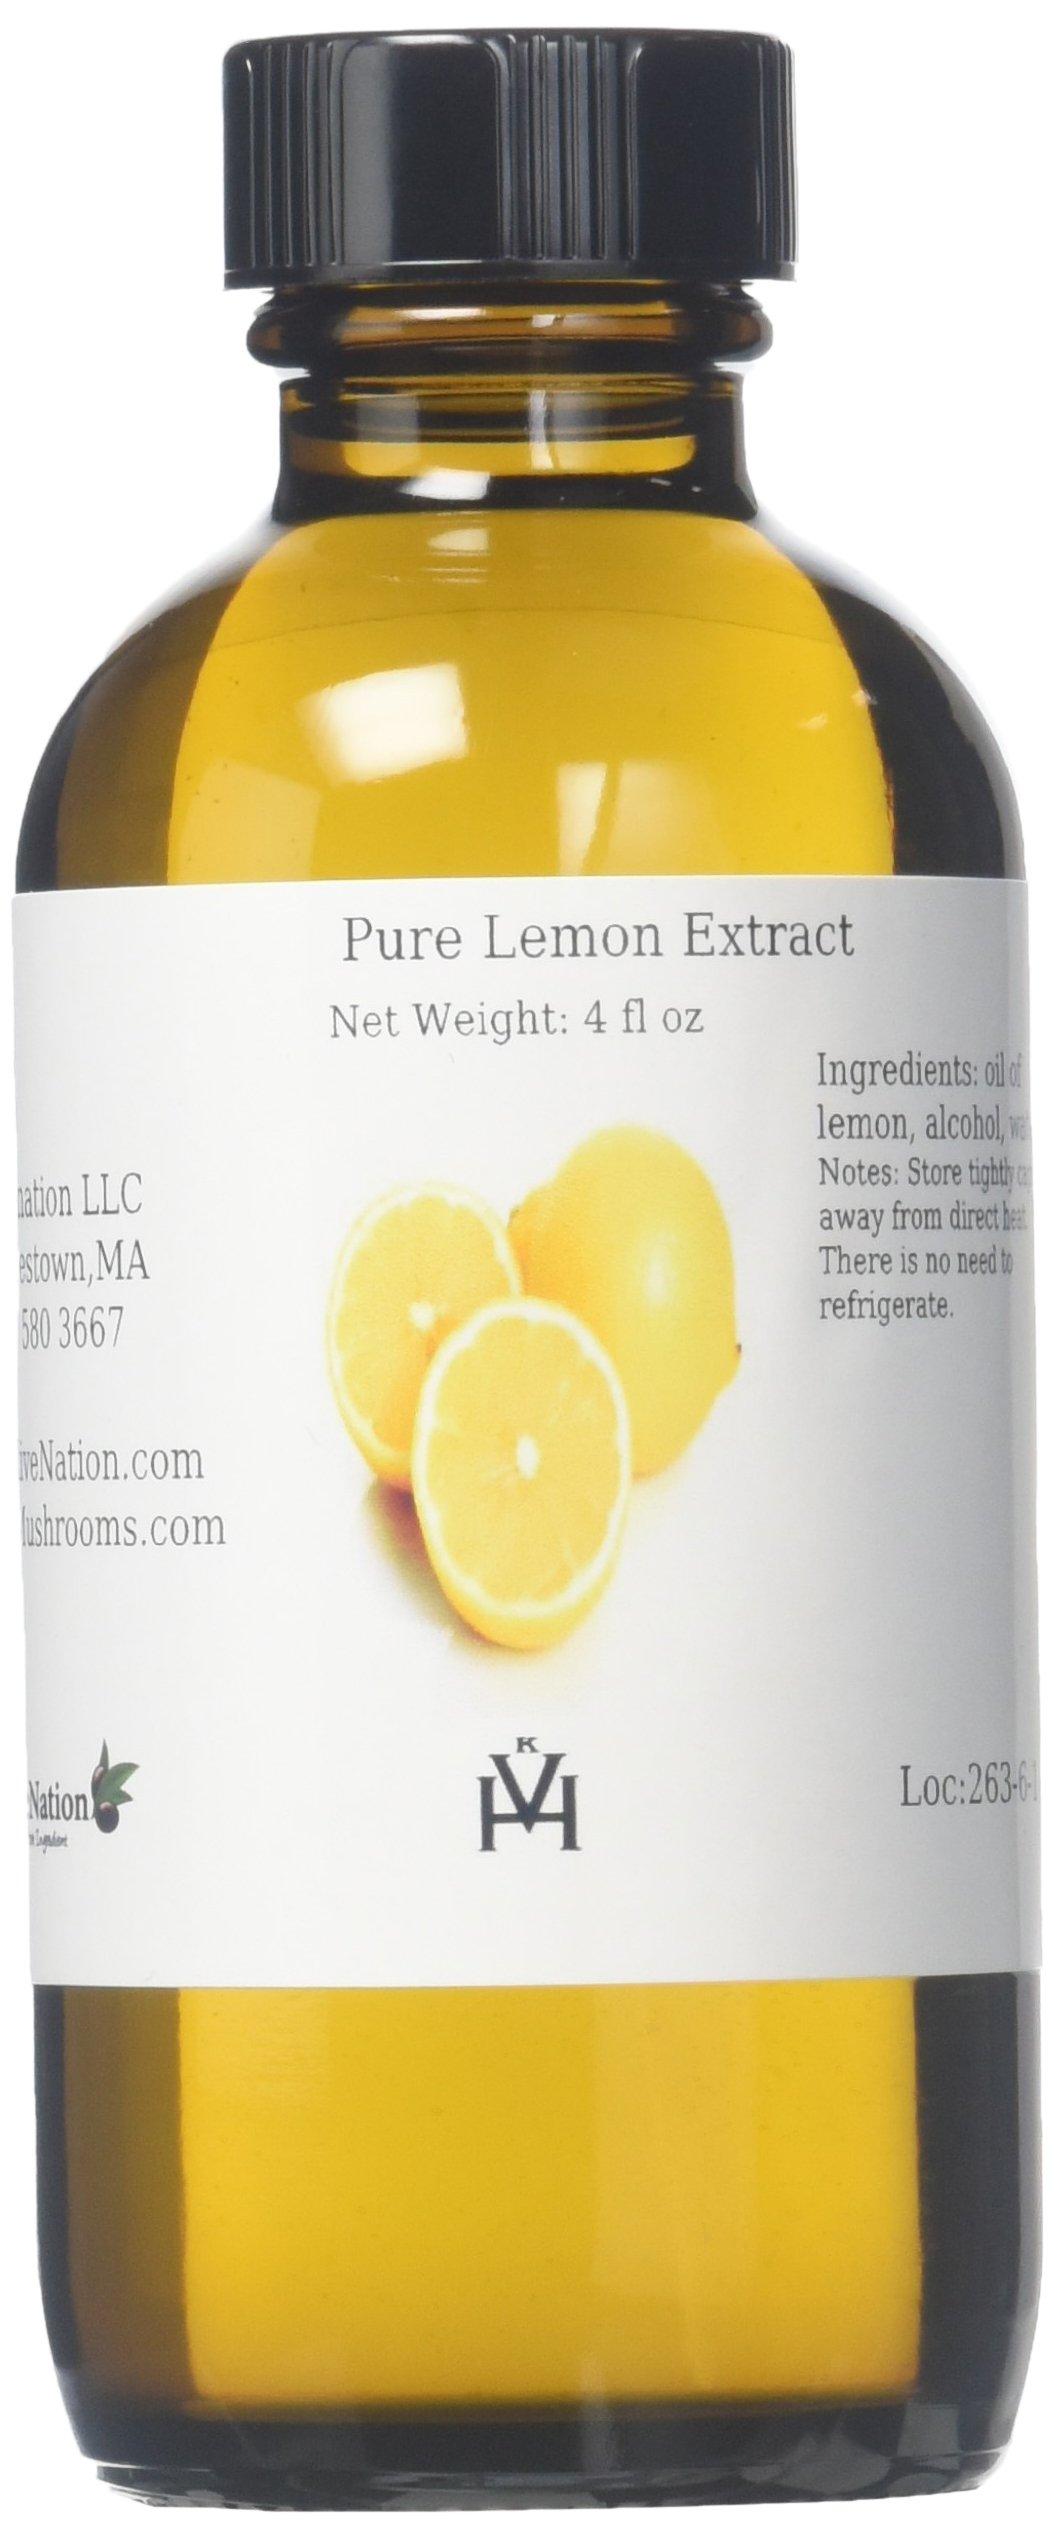 OliveNation Pure Lemon Extract for Baking, Tart Lemony Flavor for Cakes, Cookies, Icing, Filling, Terpeneless, PG Free, Non-GMO, Gluten Free, Kosher, Vegan - 4 ounces